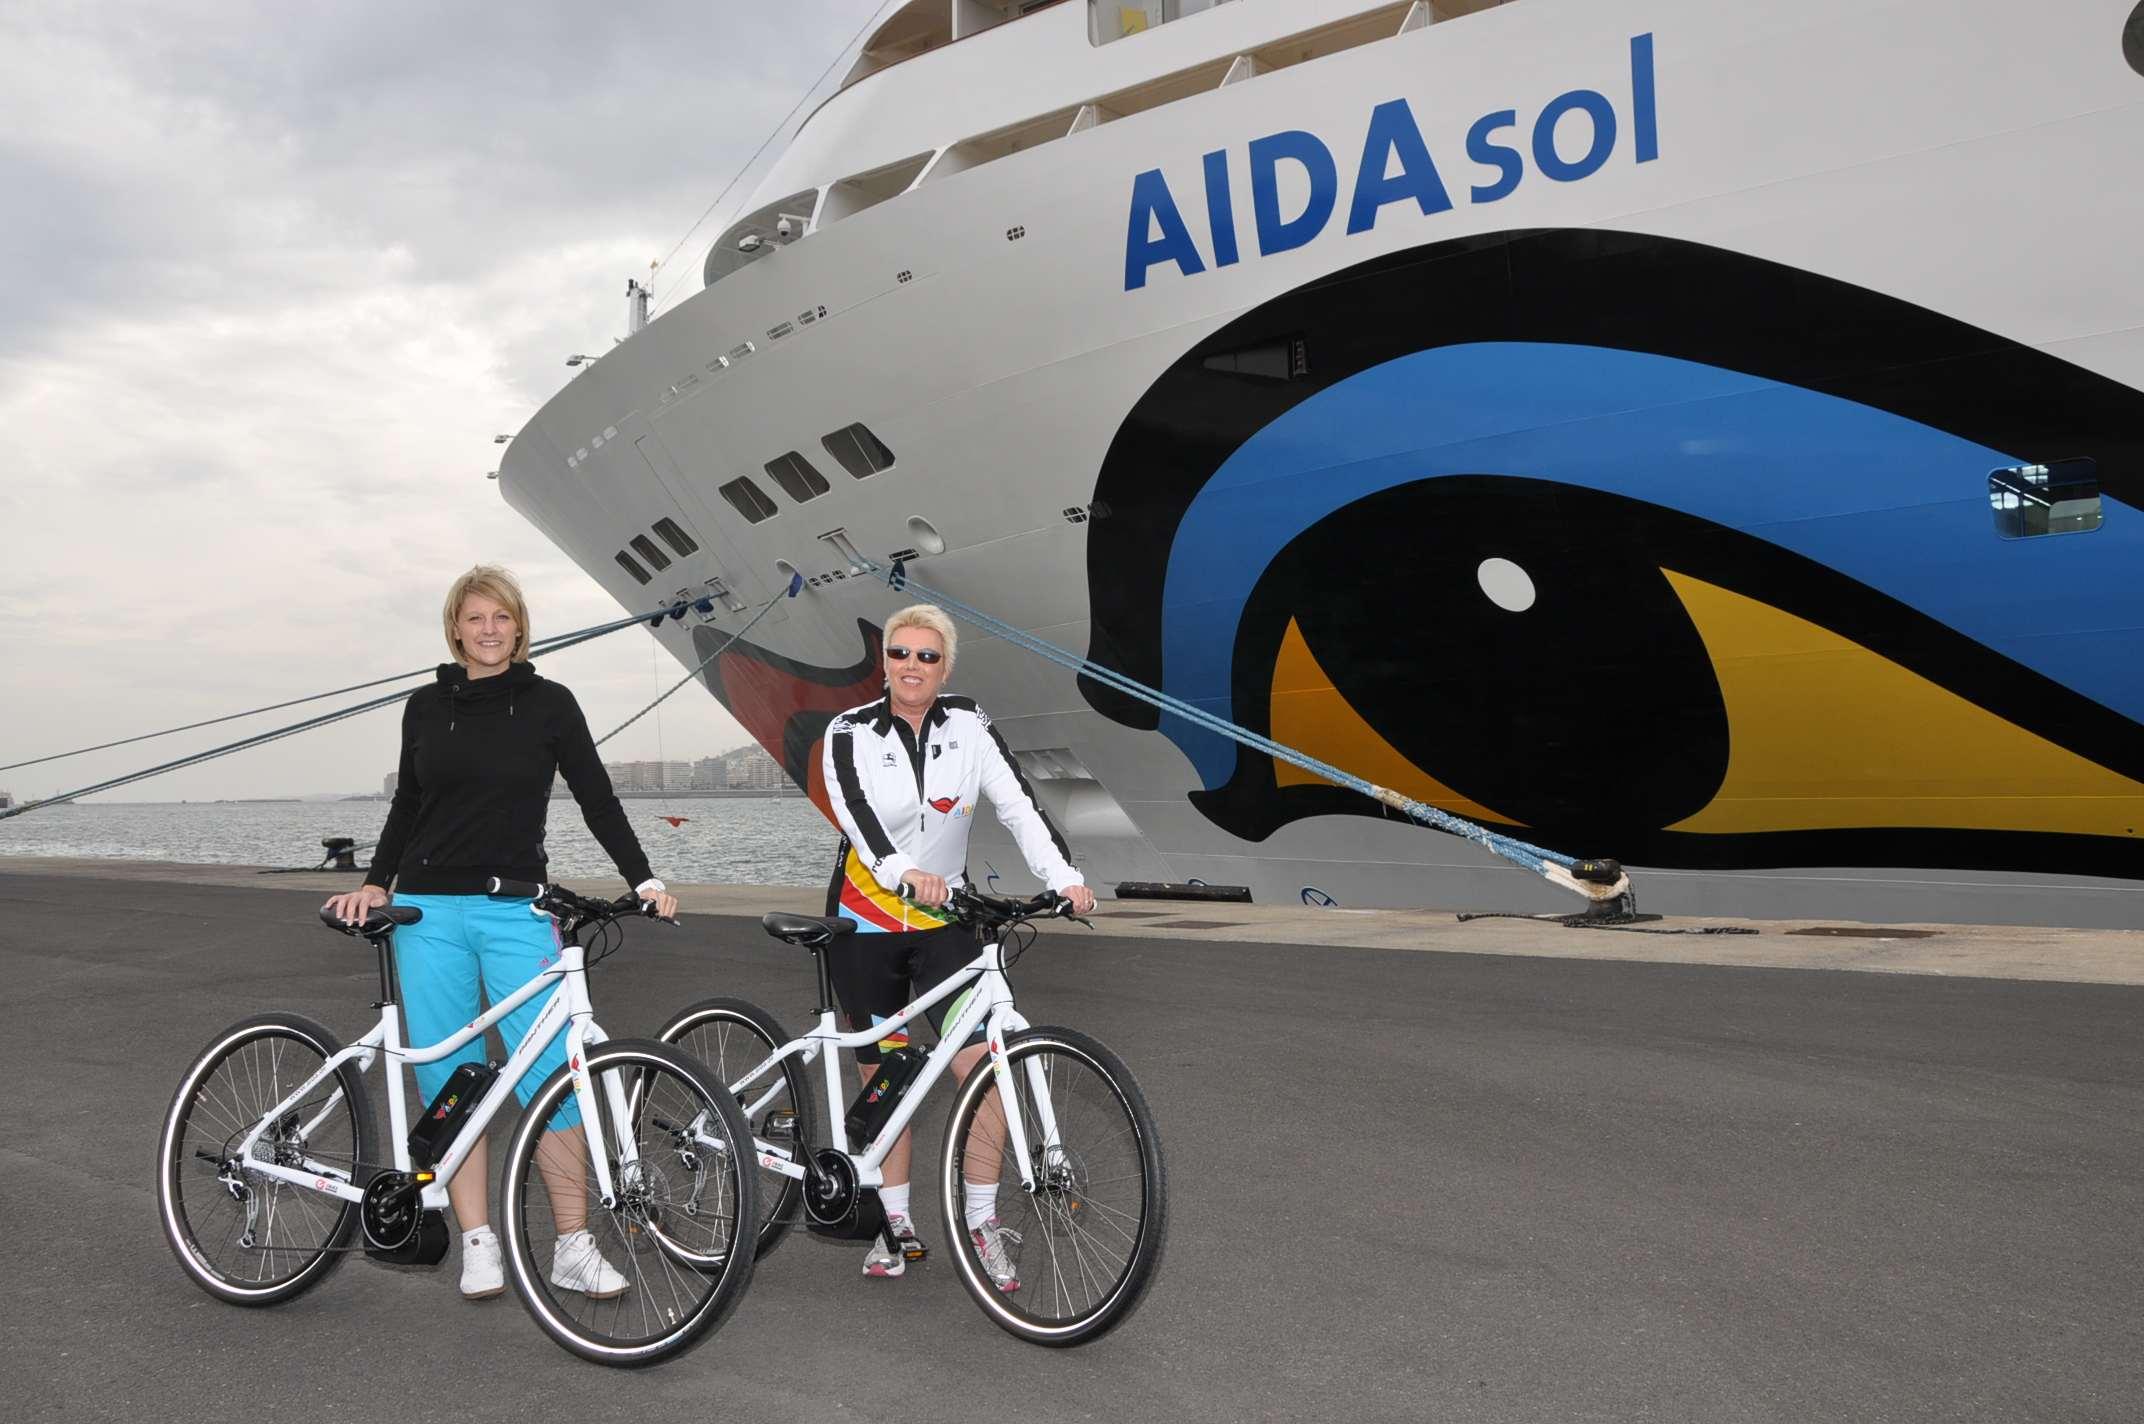 Aida Kreuzfahrtschiffe nehmen Elektrofahrräder an Bord. © spothits/AIDA Cruises